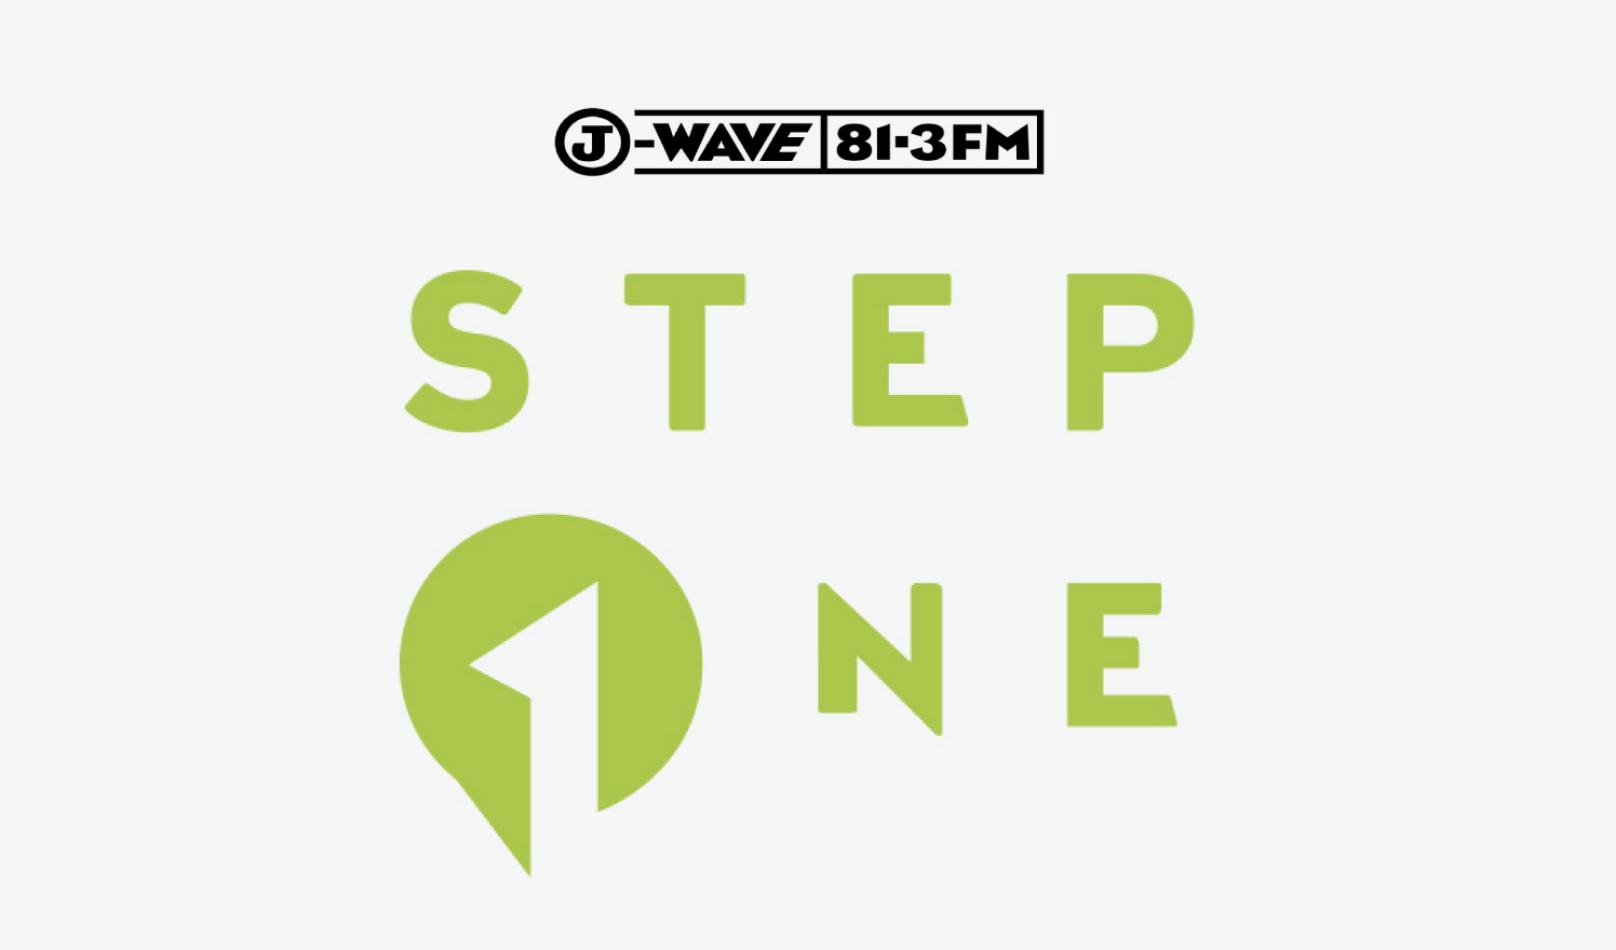 The 営業ツールが、J-WAVE「STEP ONE」で紹介されました。